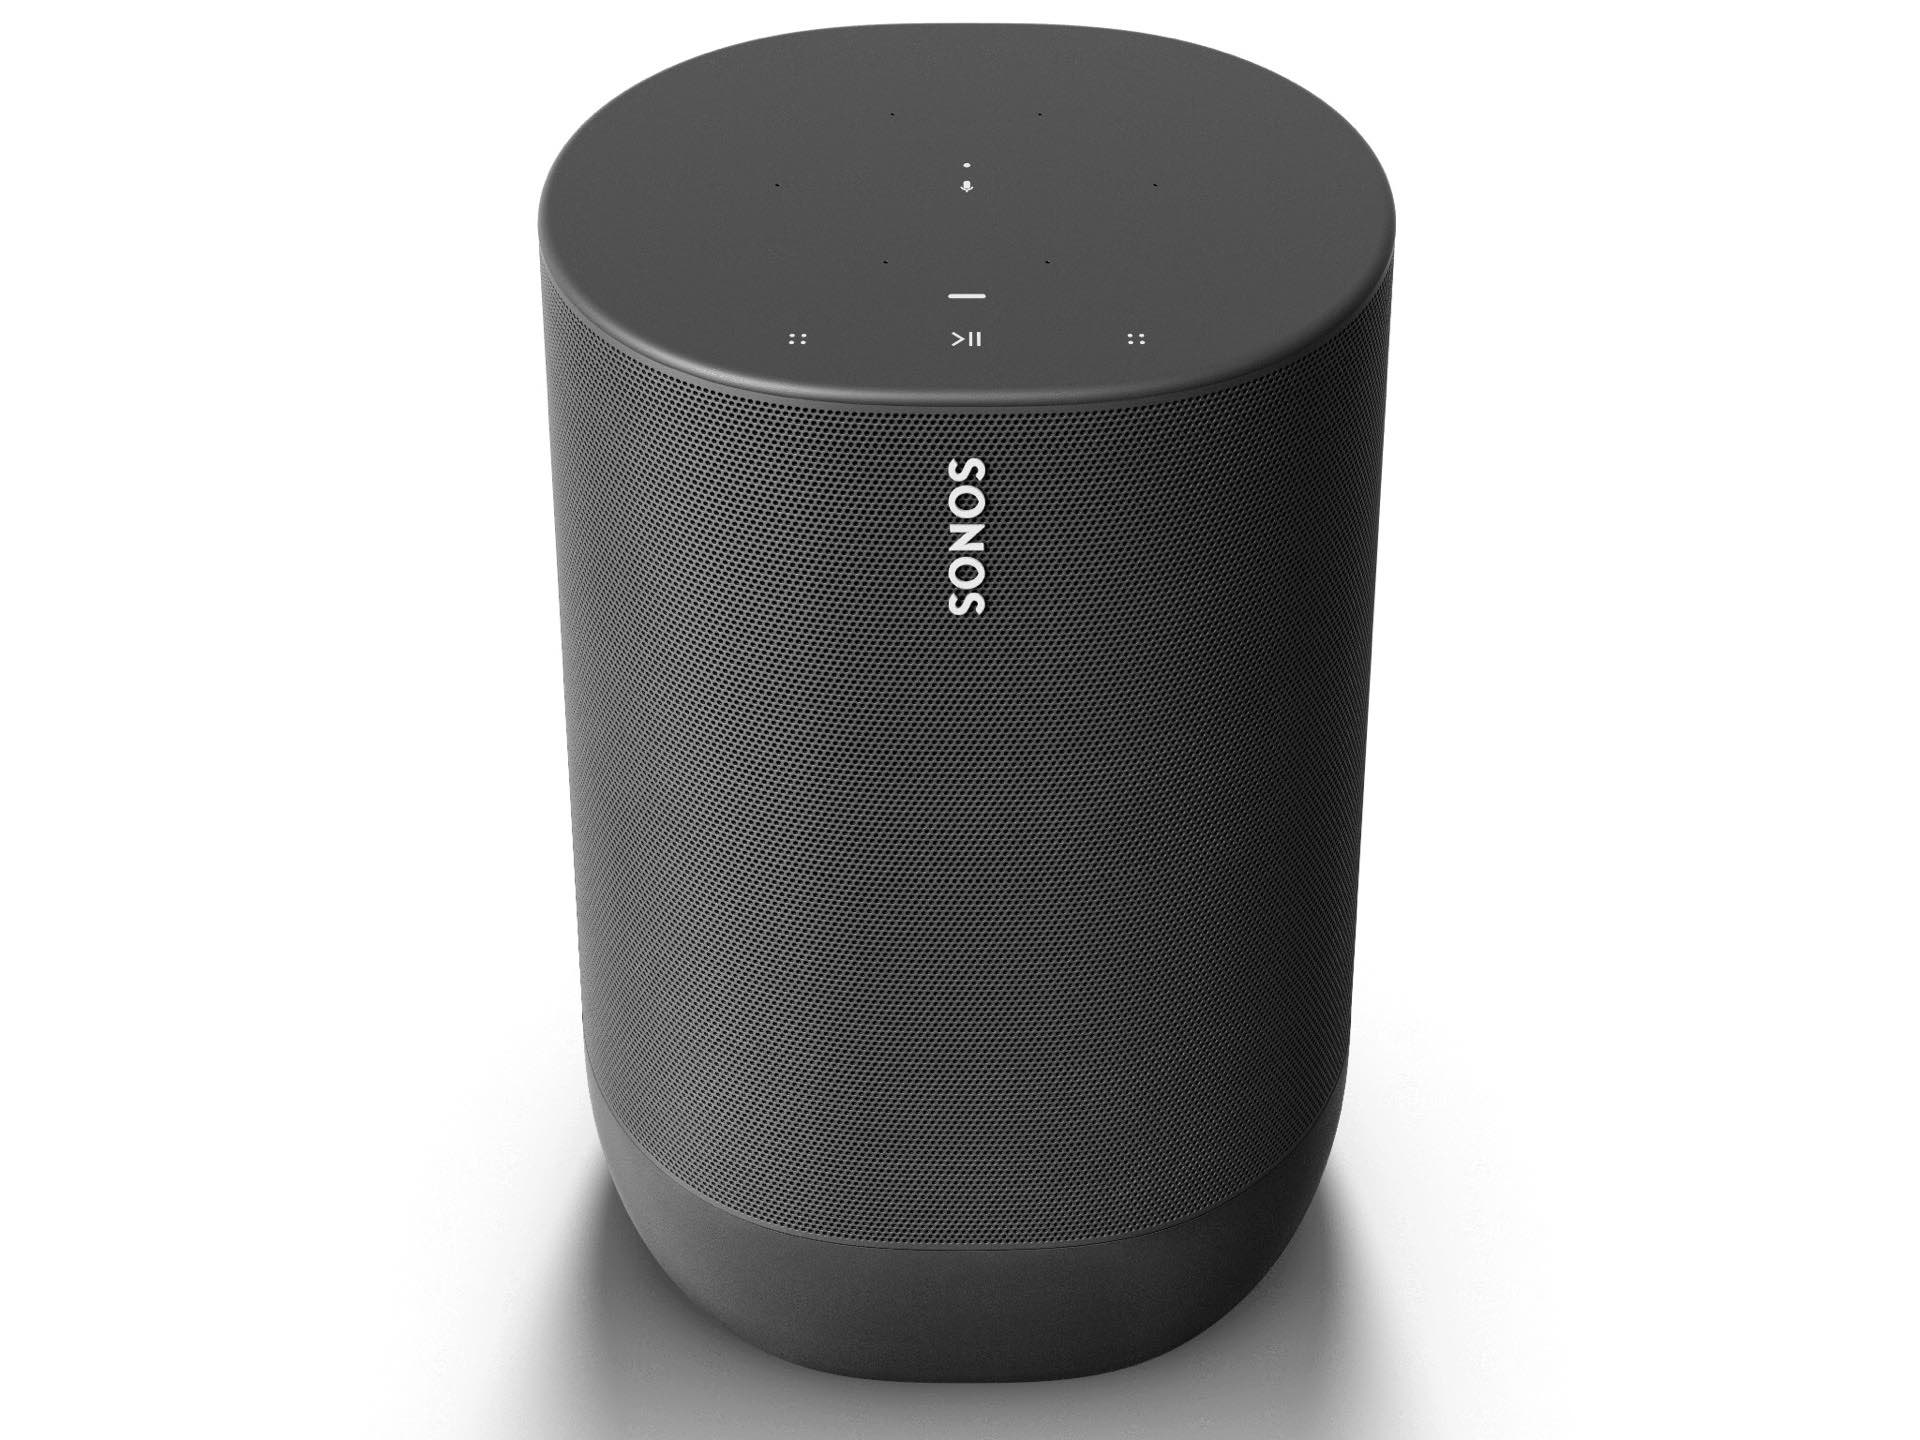 sonos-move-smart-speaker